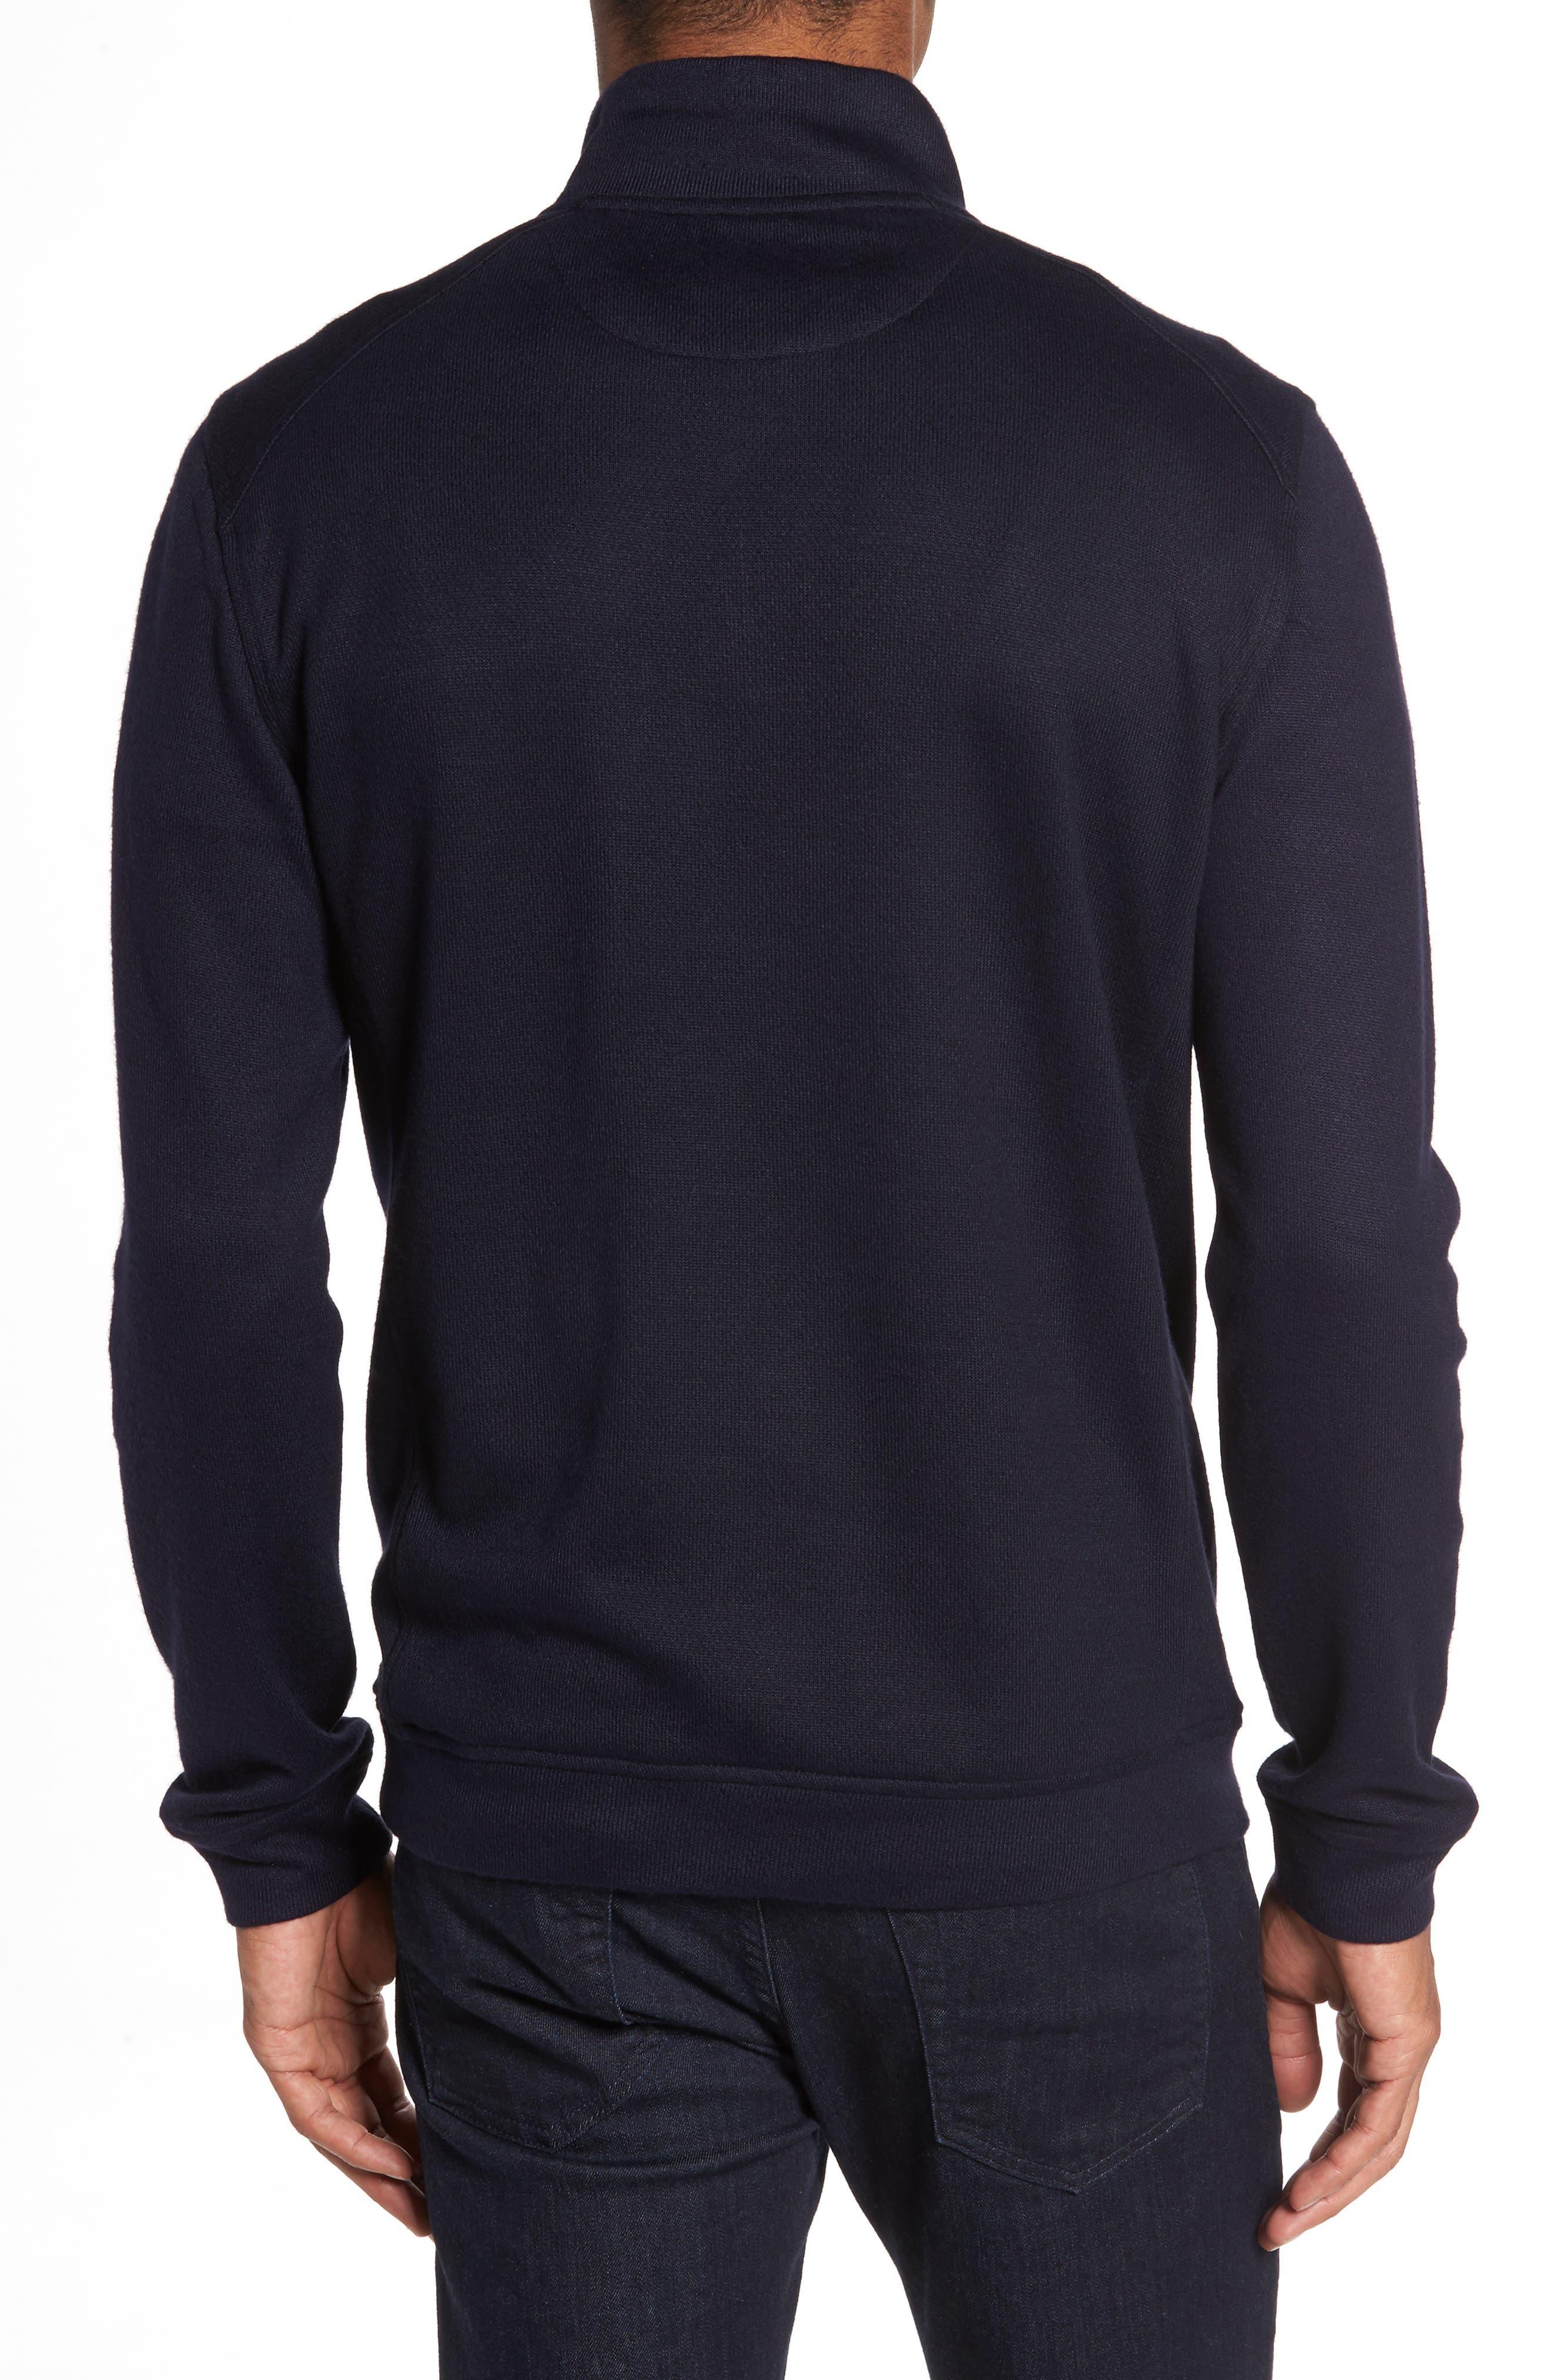 Dotkot Slim Fit Quarter Zip Pullover,                             Alternate thumbnail 2, color,                             410